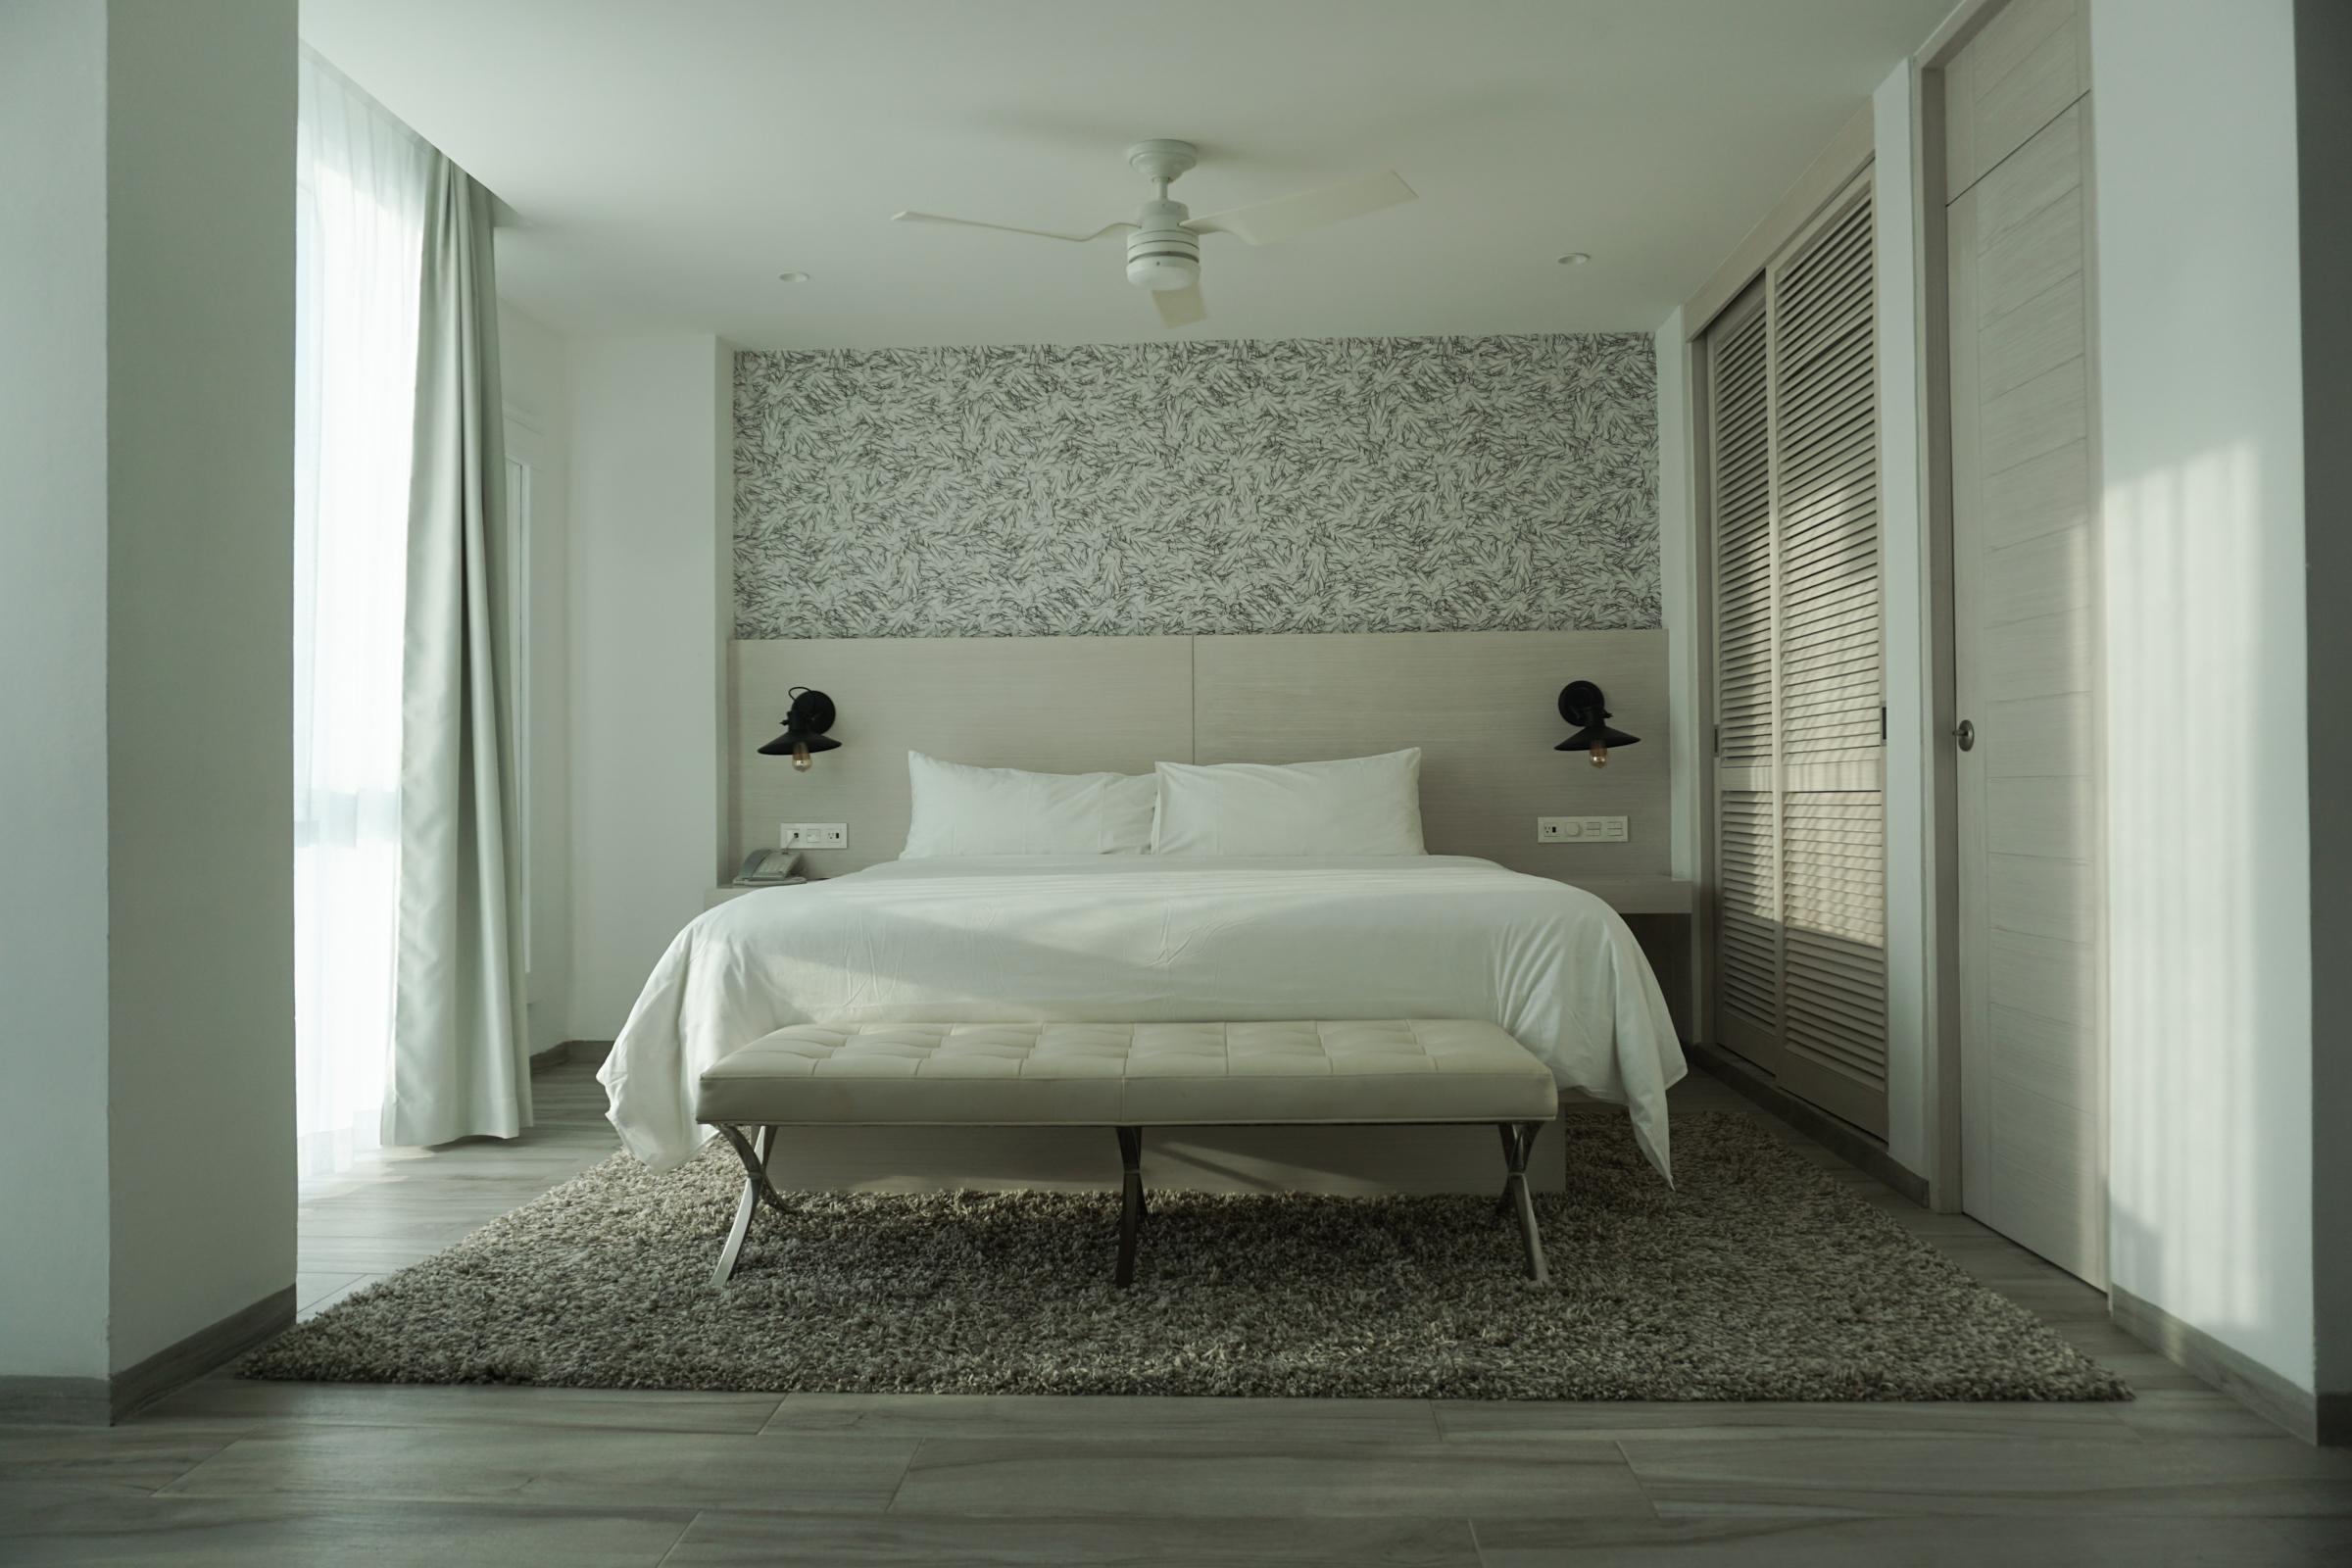 where-to-go-on-holiday-cancun-hotel-oleo-mexico-minas-planet-jamesgreen17.jpg